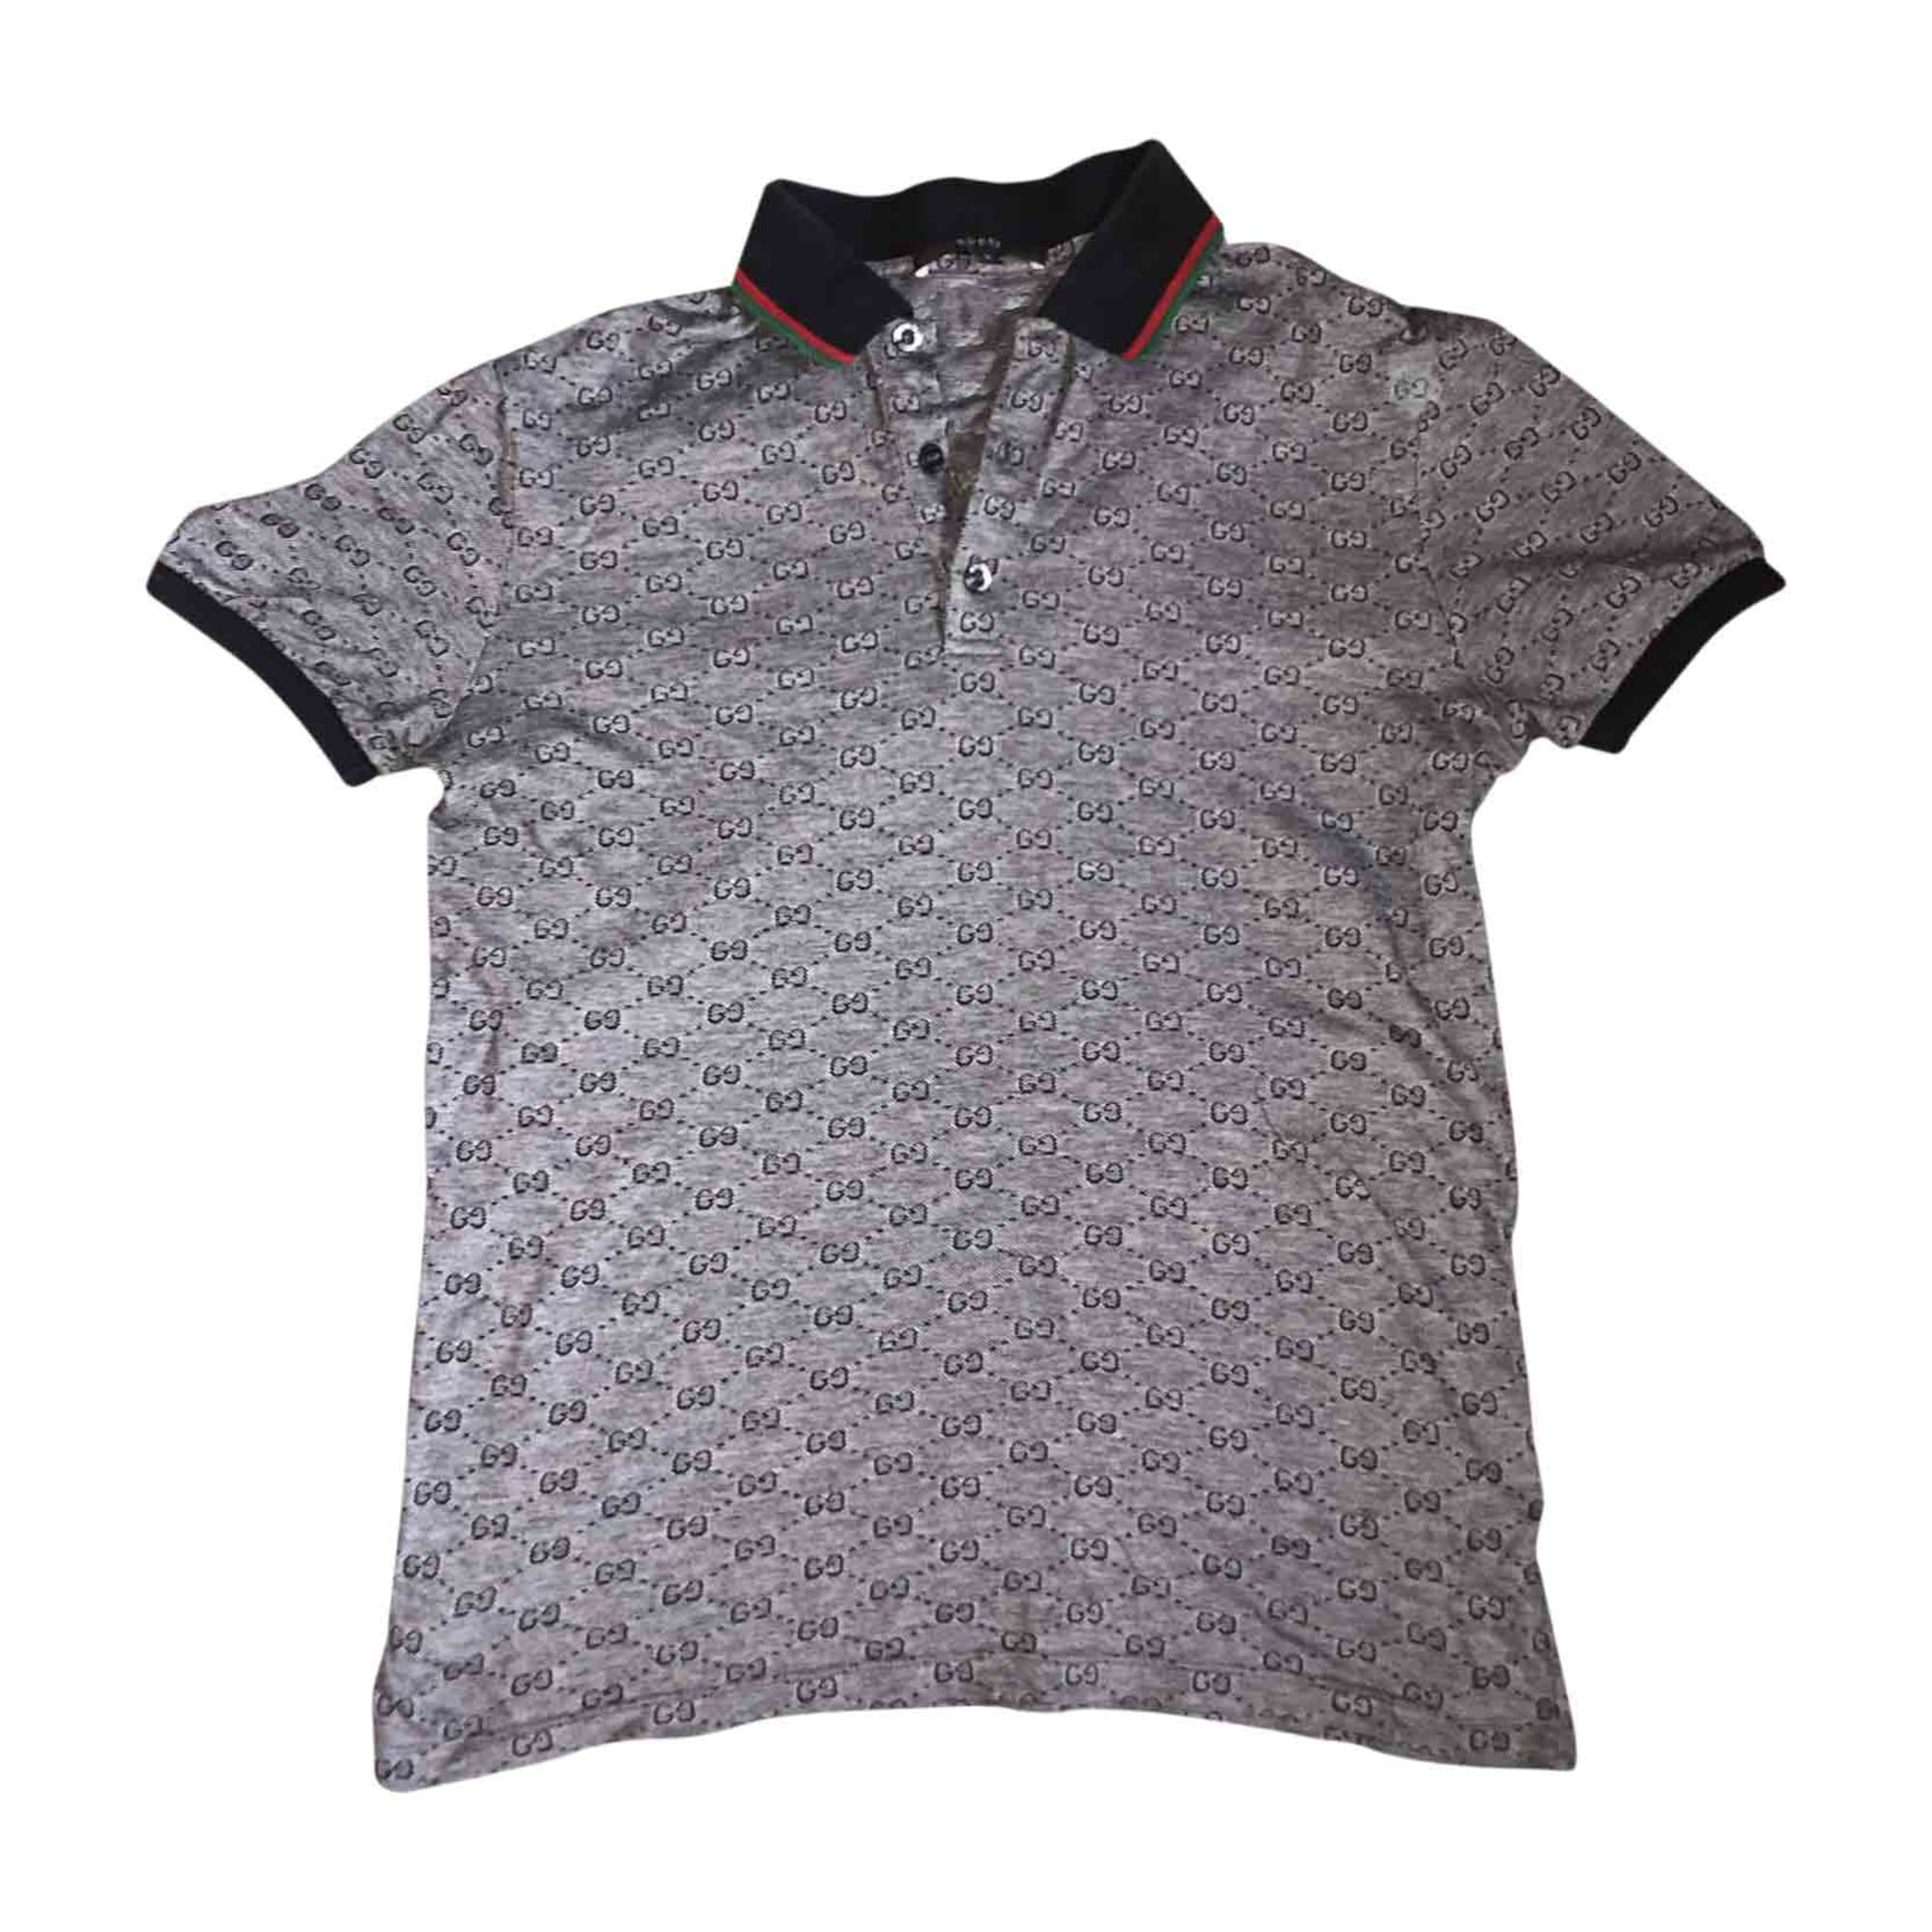 Polo GUCCI 1 (S) gray vendu par Sathya 5 - 7067752 b412a8f86eb5